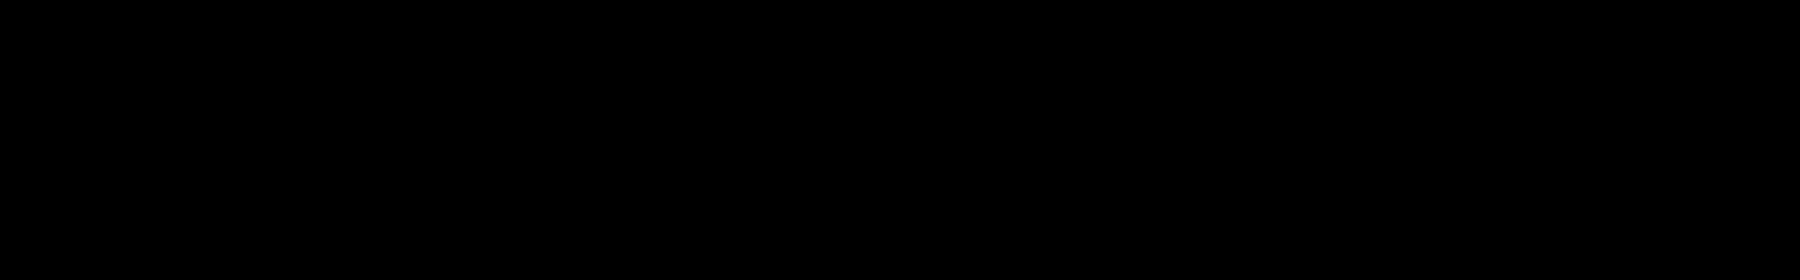 Antidote - Mainstream Trap audio waveform